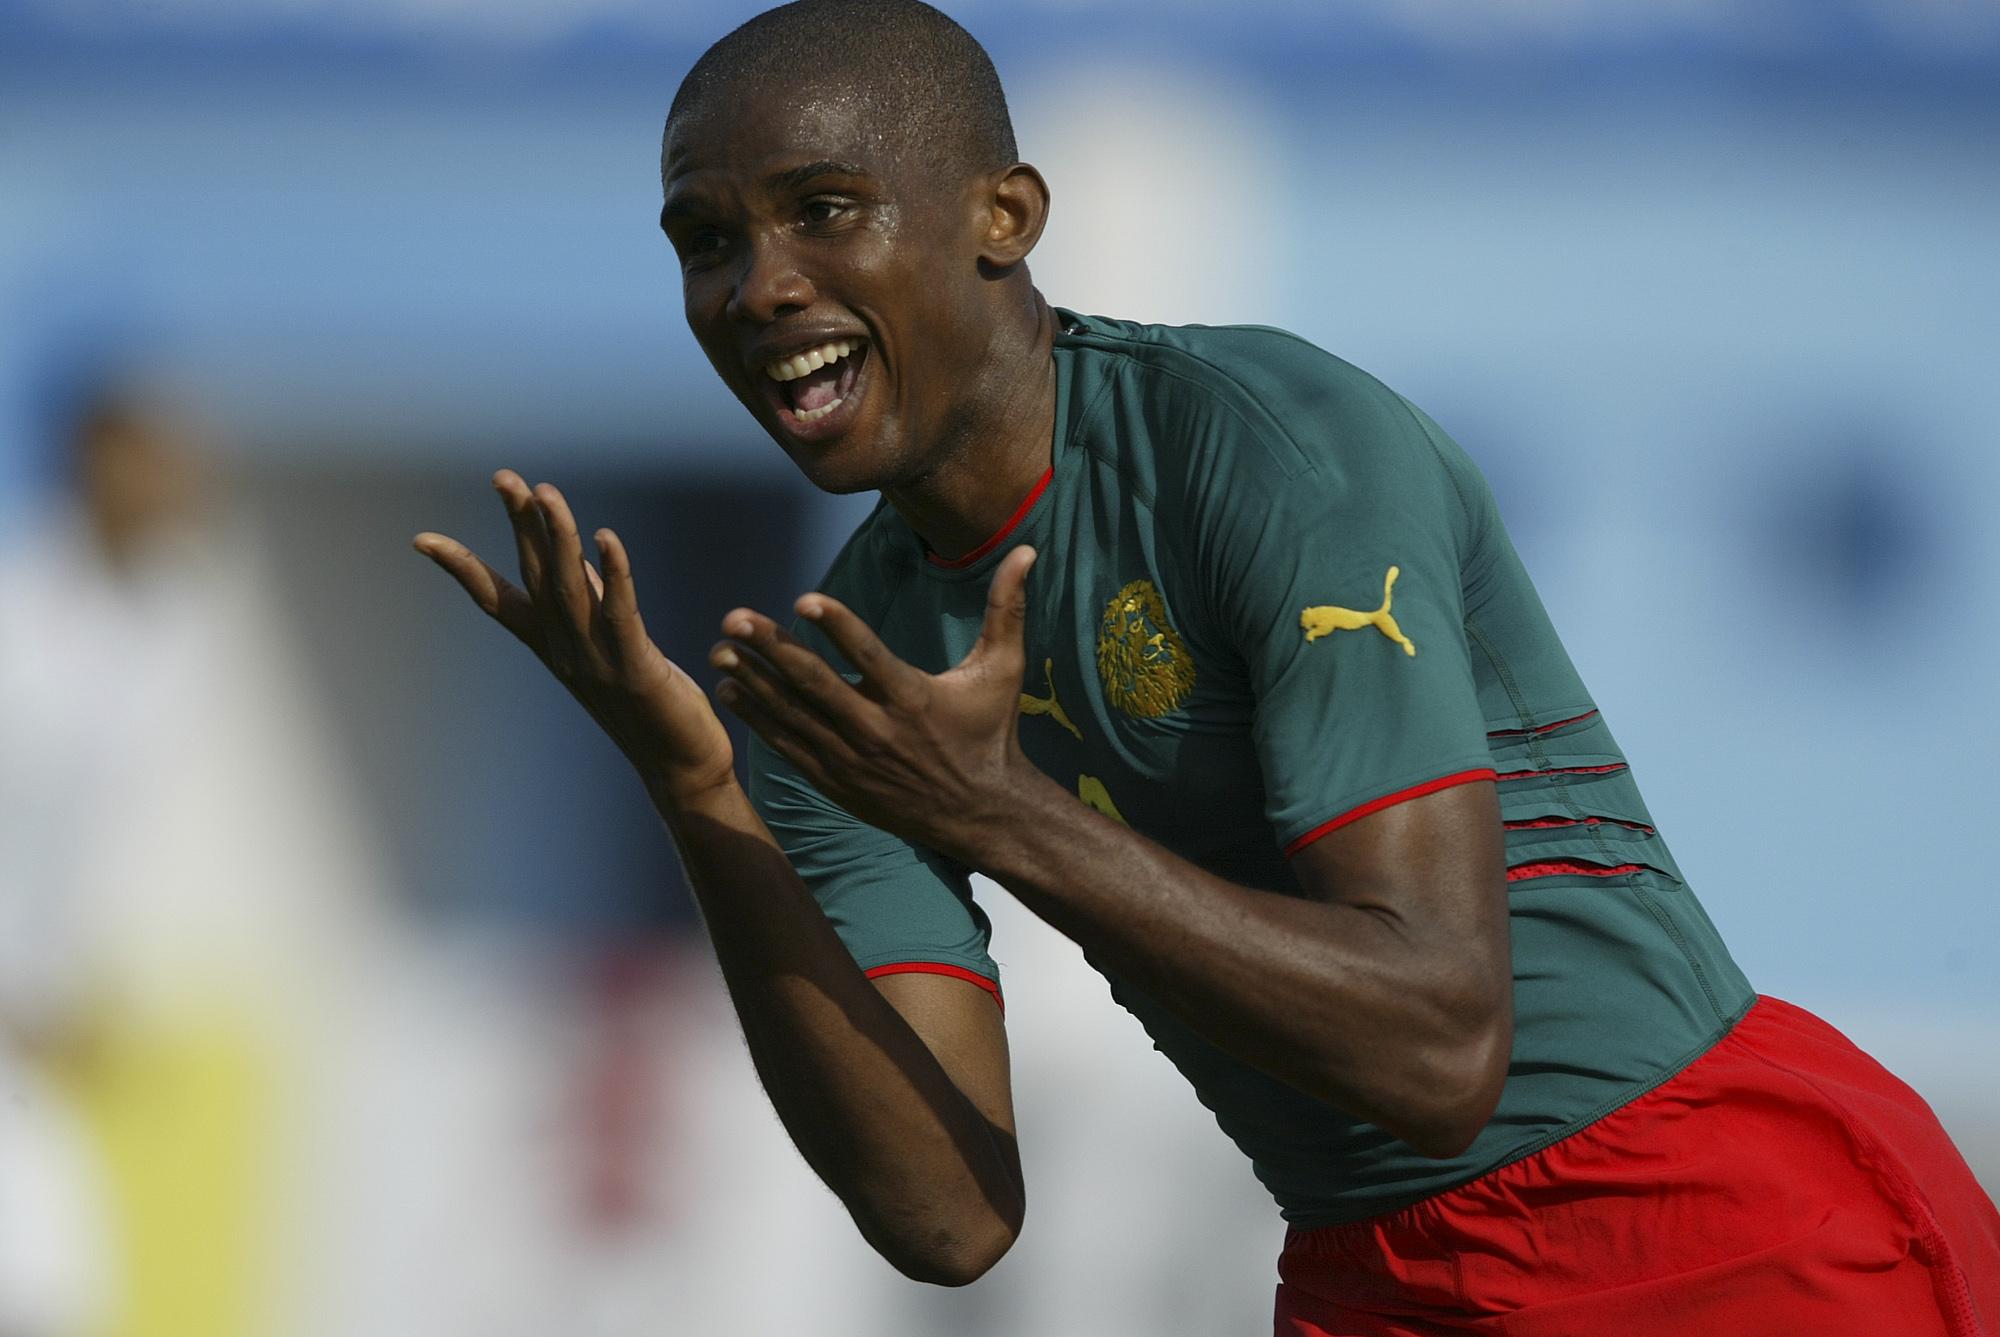 Célébration Samuel Eto'o (Cameroun vs Nigéria, Monastir, TUNISIE, CAN 2004) Copyright JEAN-MARIE HERVIO